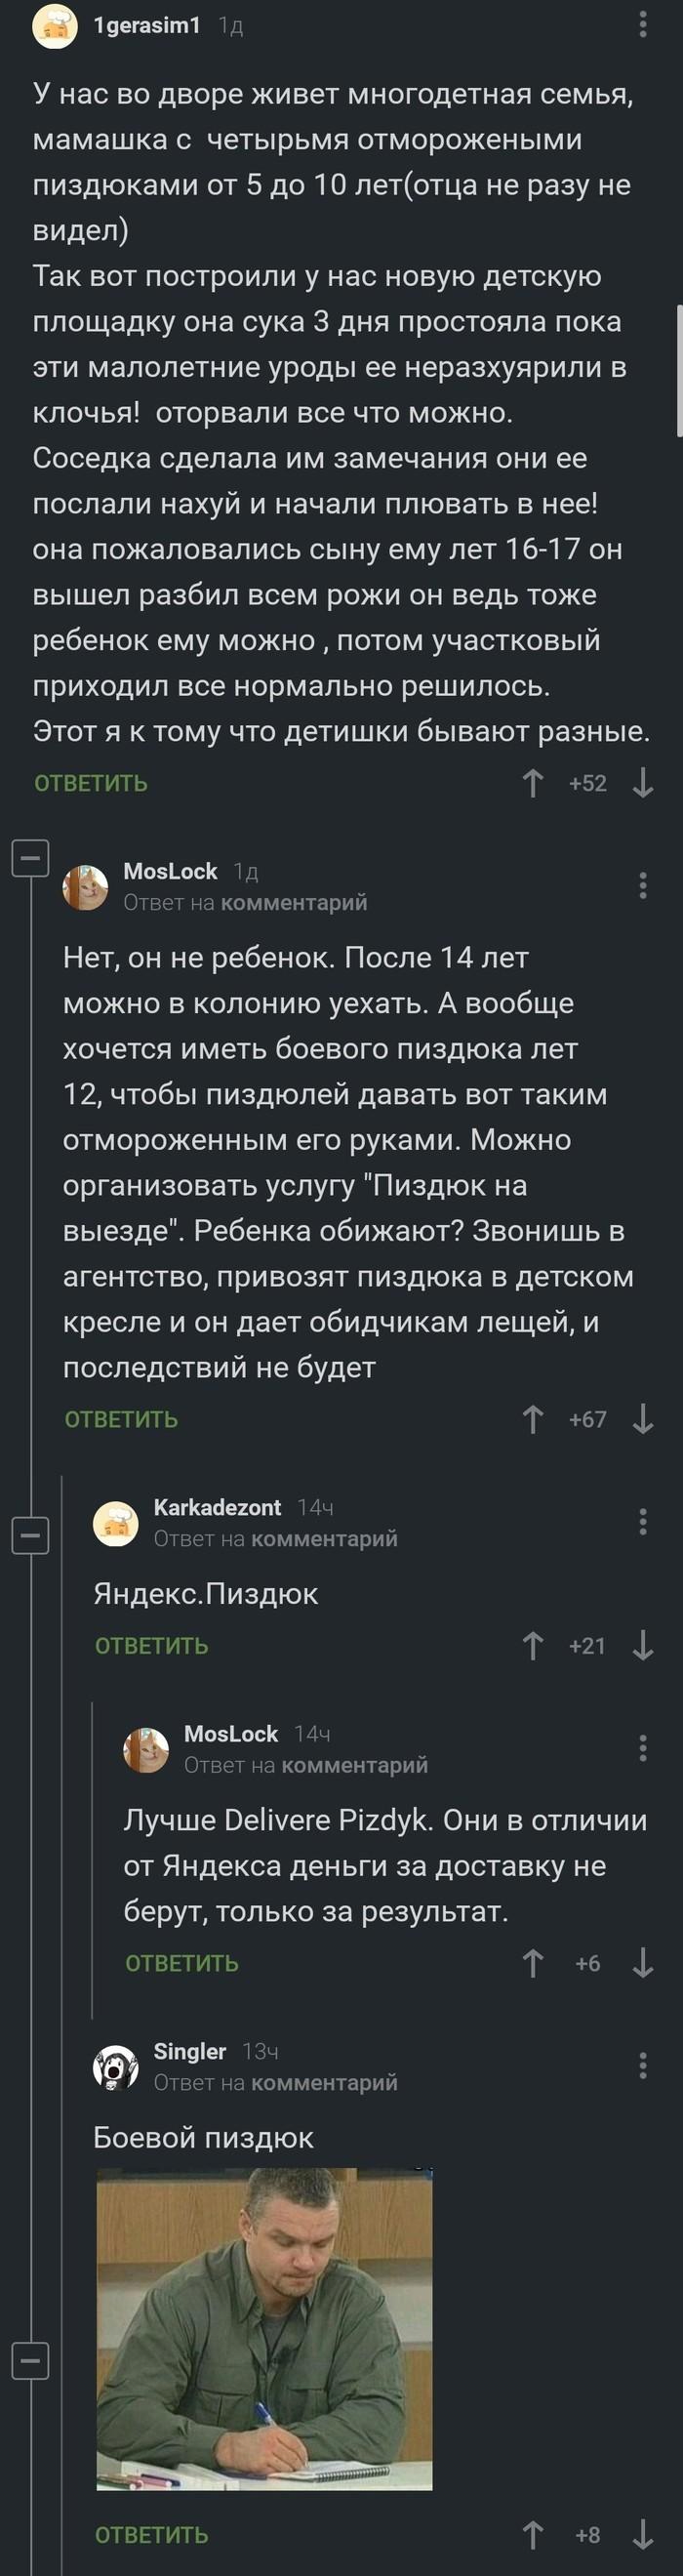 Яндекс.Малой Скриншот, Комментарии на Пикабу, Длиннопост